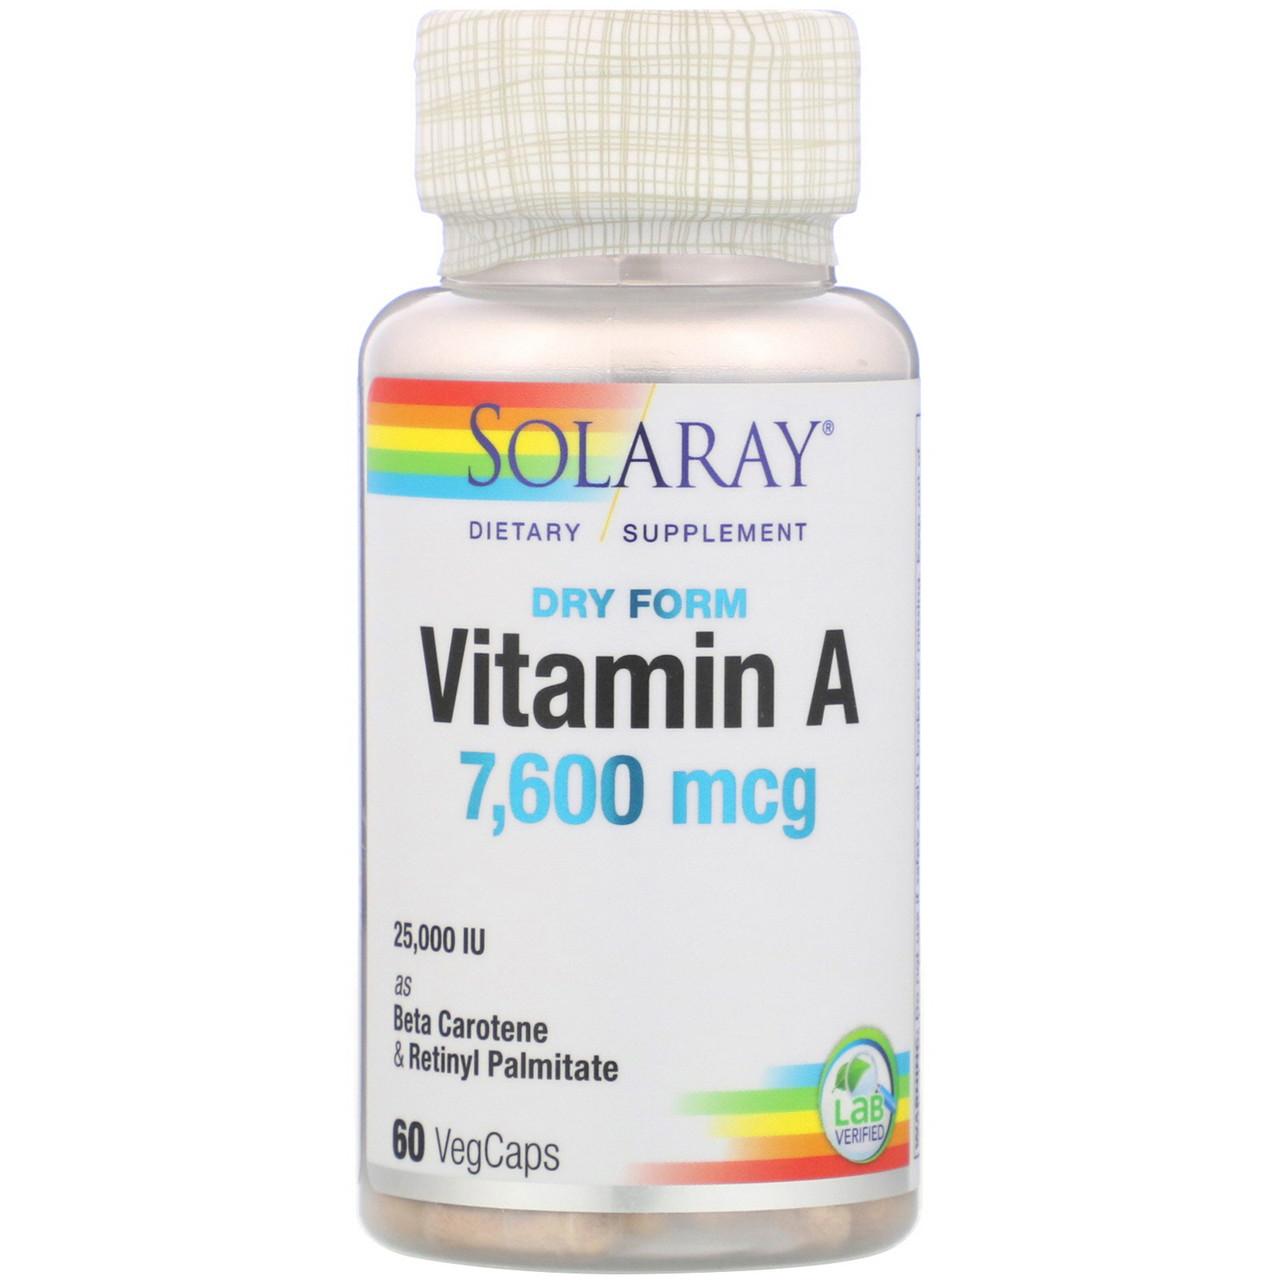 Витамин A Solaray сухой формы, 25000 МЕ, 60 капсул